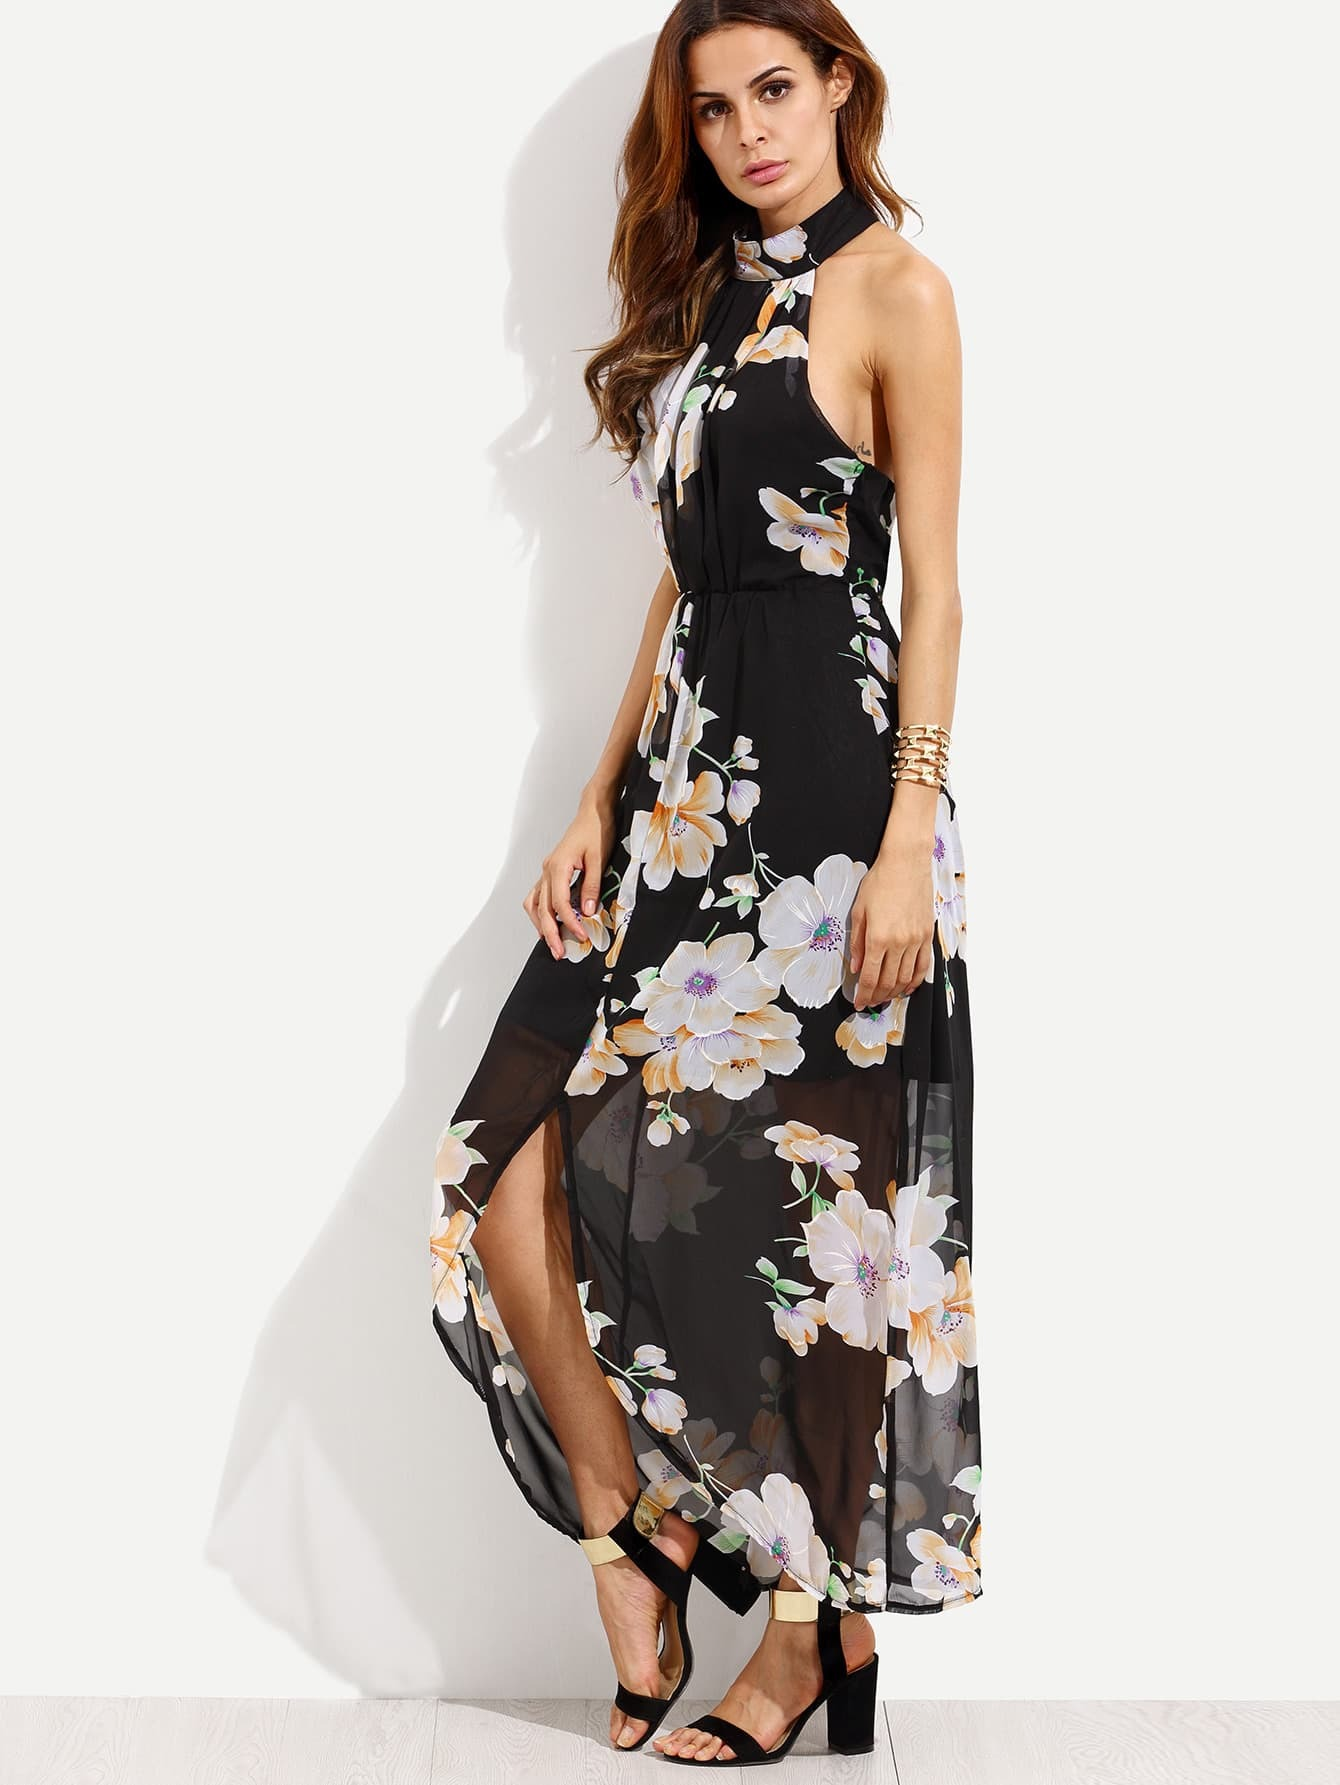 Black Flower Print Halter Neck Slit Chiffon DressBlack Flower Print Halter Neck Slit Chiffon Dress<br><br>color: Black<br>size: L,M,S,XL